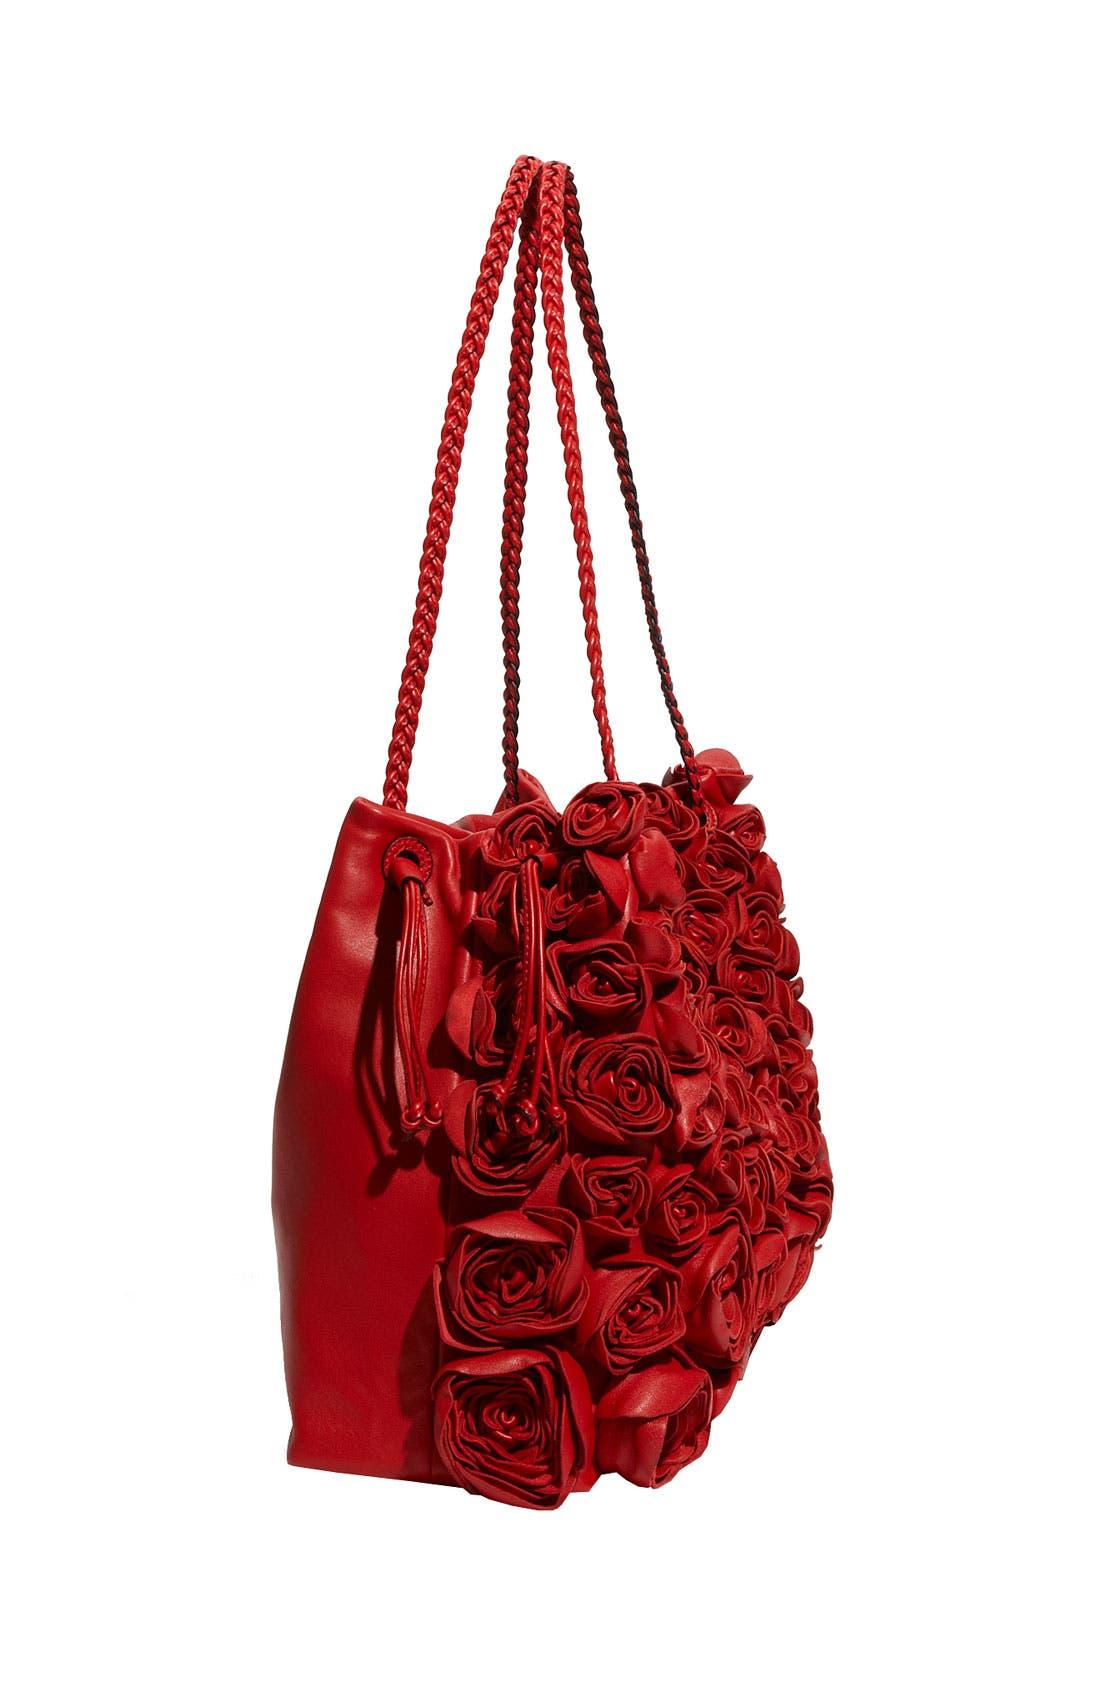 VALENTINO,                             'Nappa Rose' Leather Tote,                             Alternate thumbnail 2, color,                             610